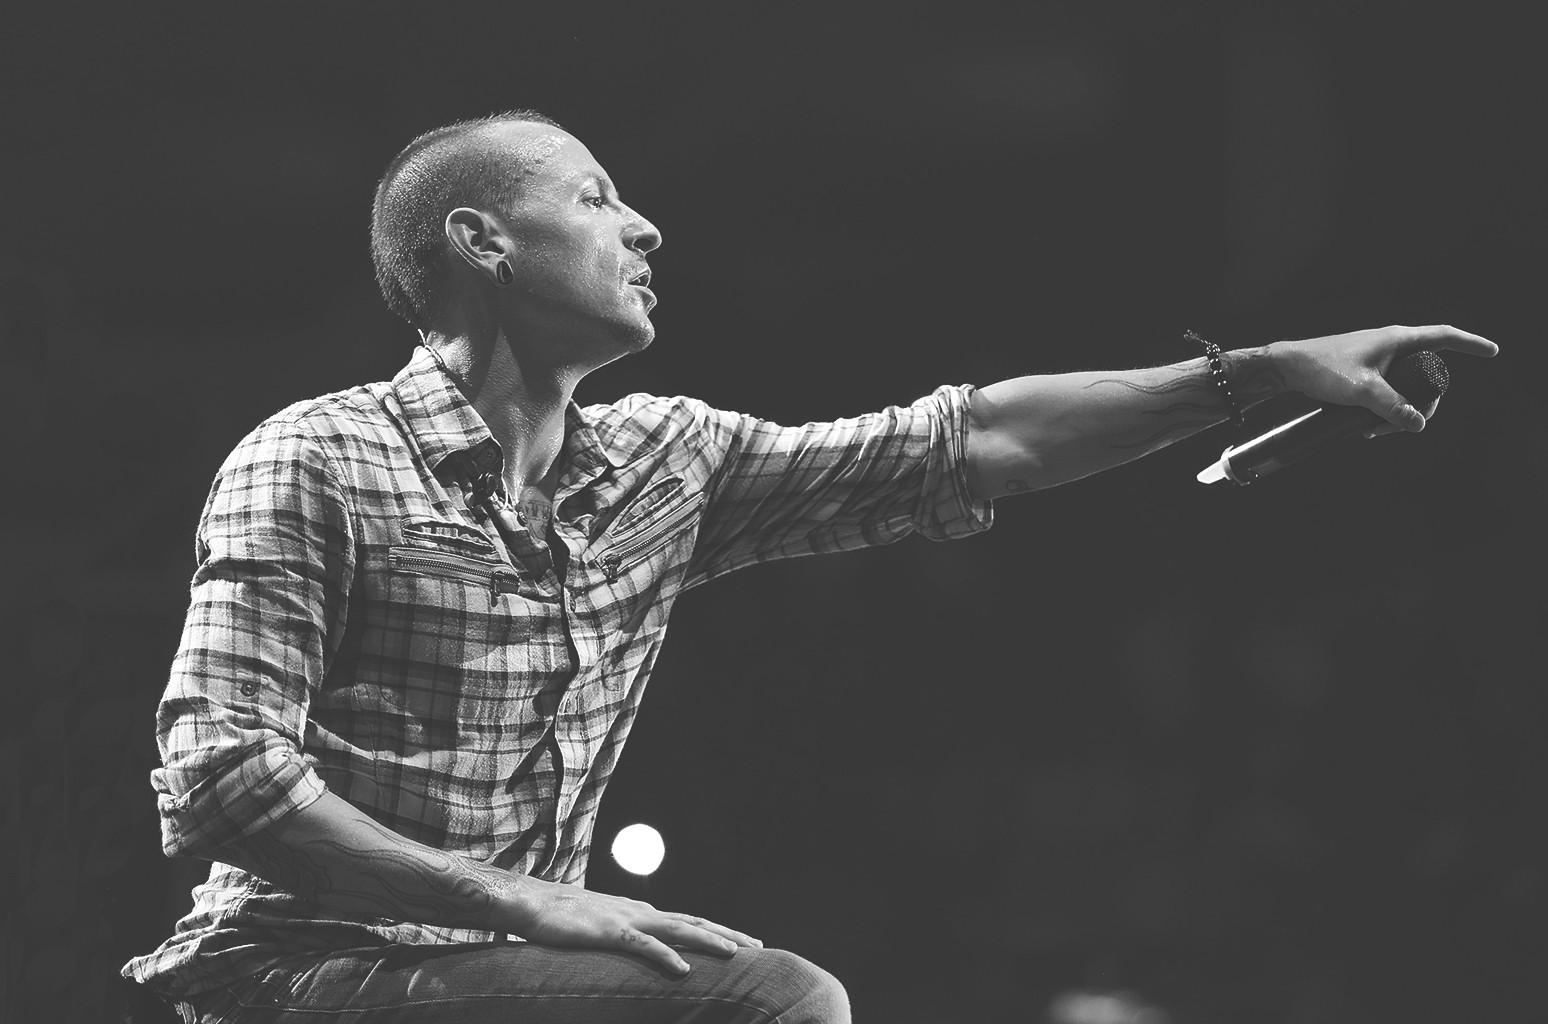 Chester Bennington of Linkin Park performs at Arena Monterrey on Sept. 12, 2012 in Monterrey, Mexico.